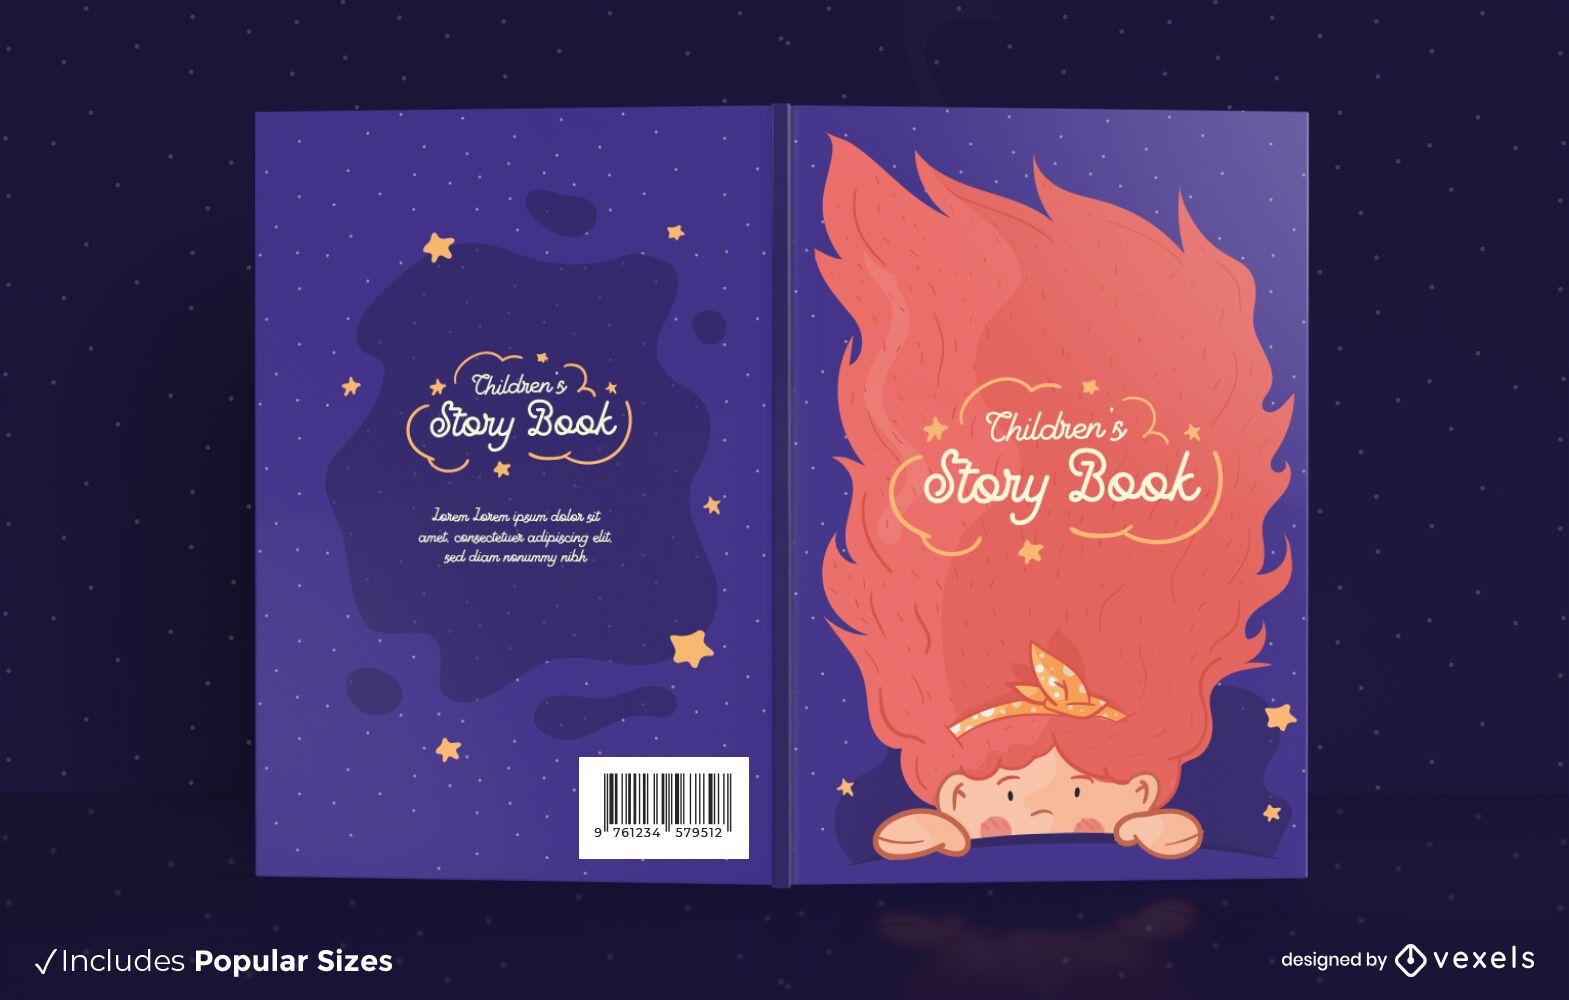 Children's story book cover design